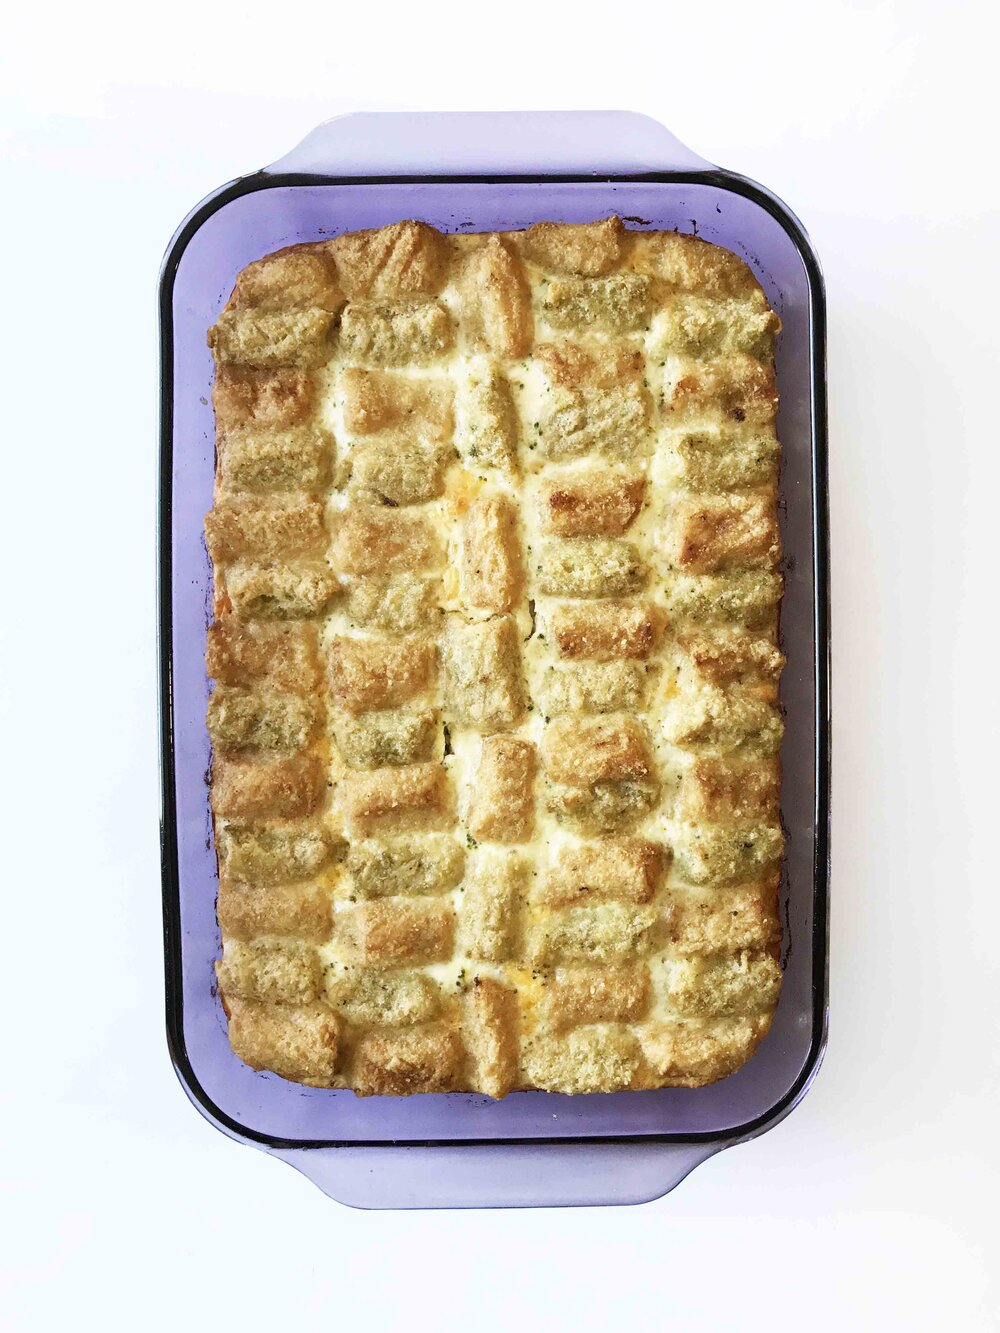 broccoli-cheese-breakfast-bake7.jpg